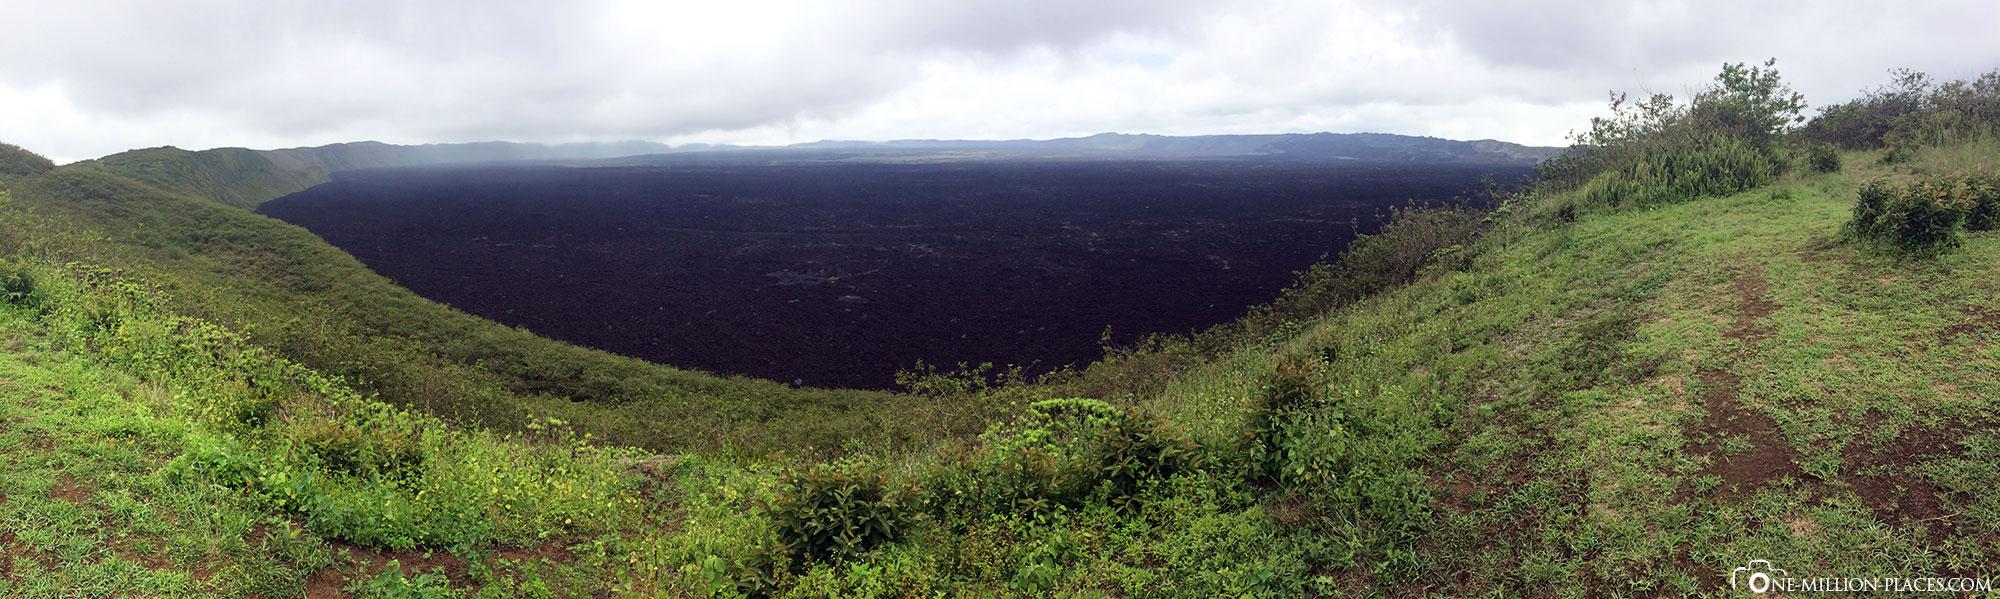 Panoramabild, Sierra Negra, Vulkan, Insel Isabella, Galapagos, Ecuador, Rundreise, Tierwelt, Reisebericht